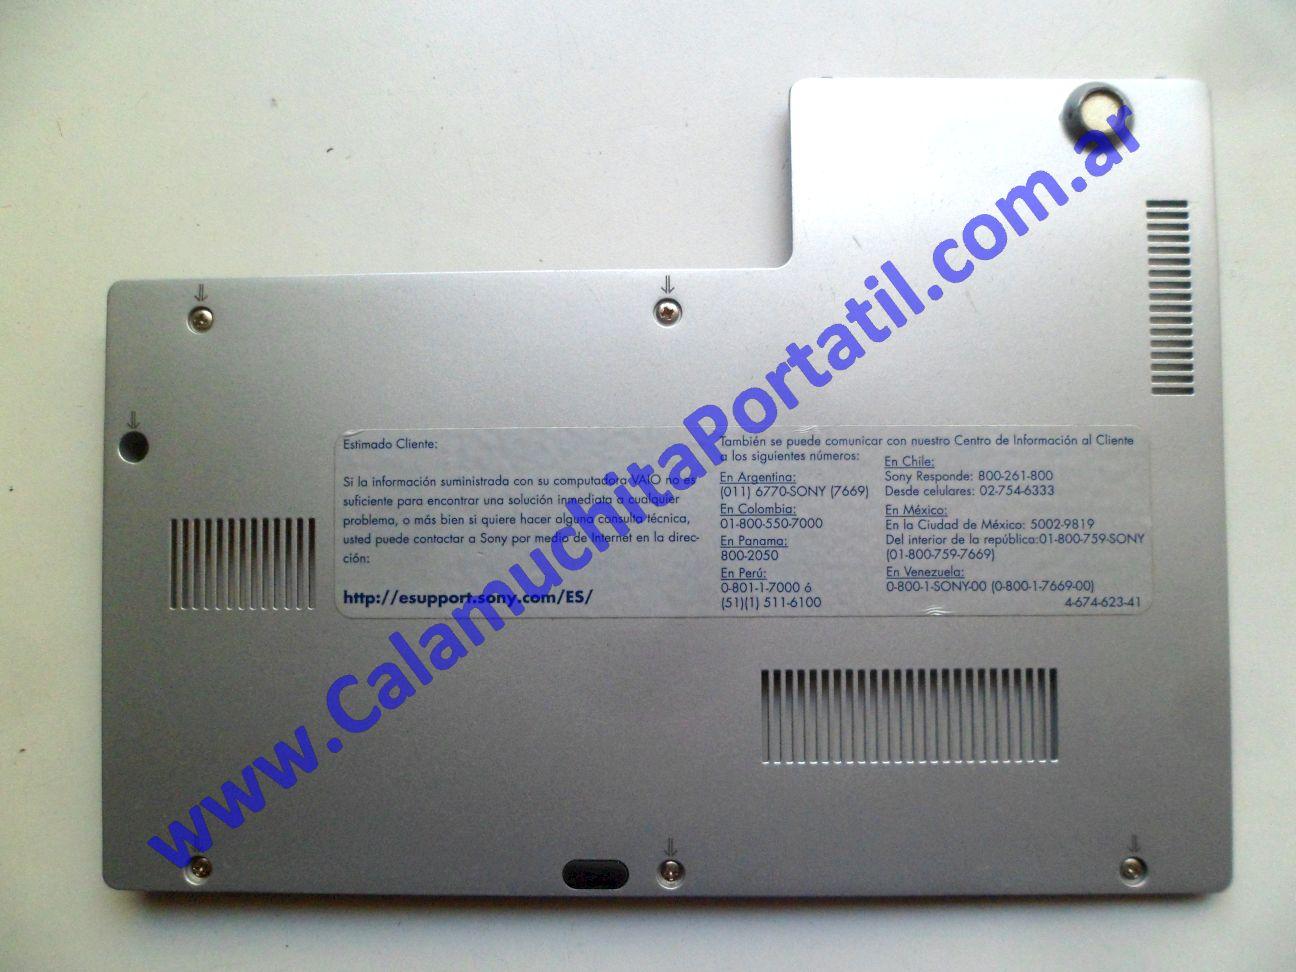 0567CTG Carcasas Tapa General Sony Vaio VGNCR260F / PCG-5J1P